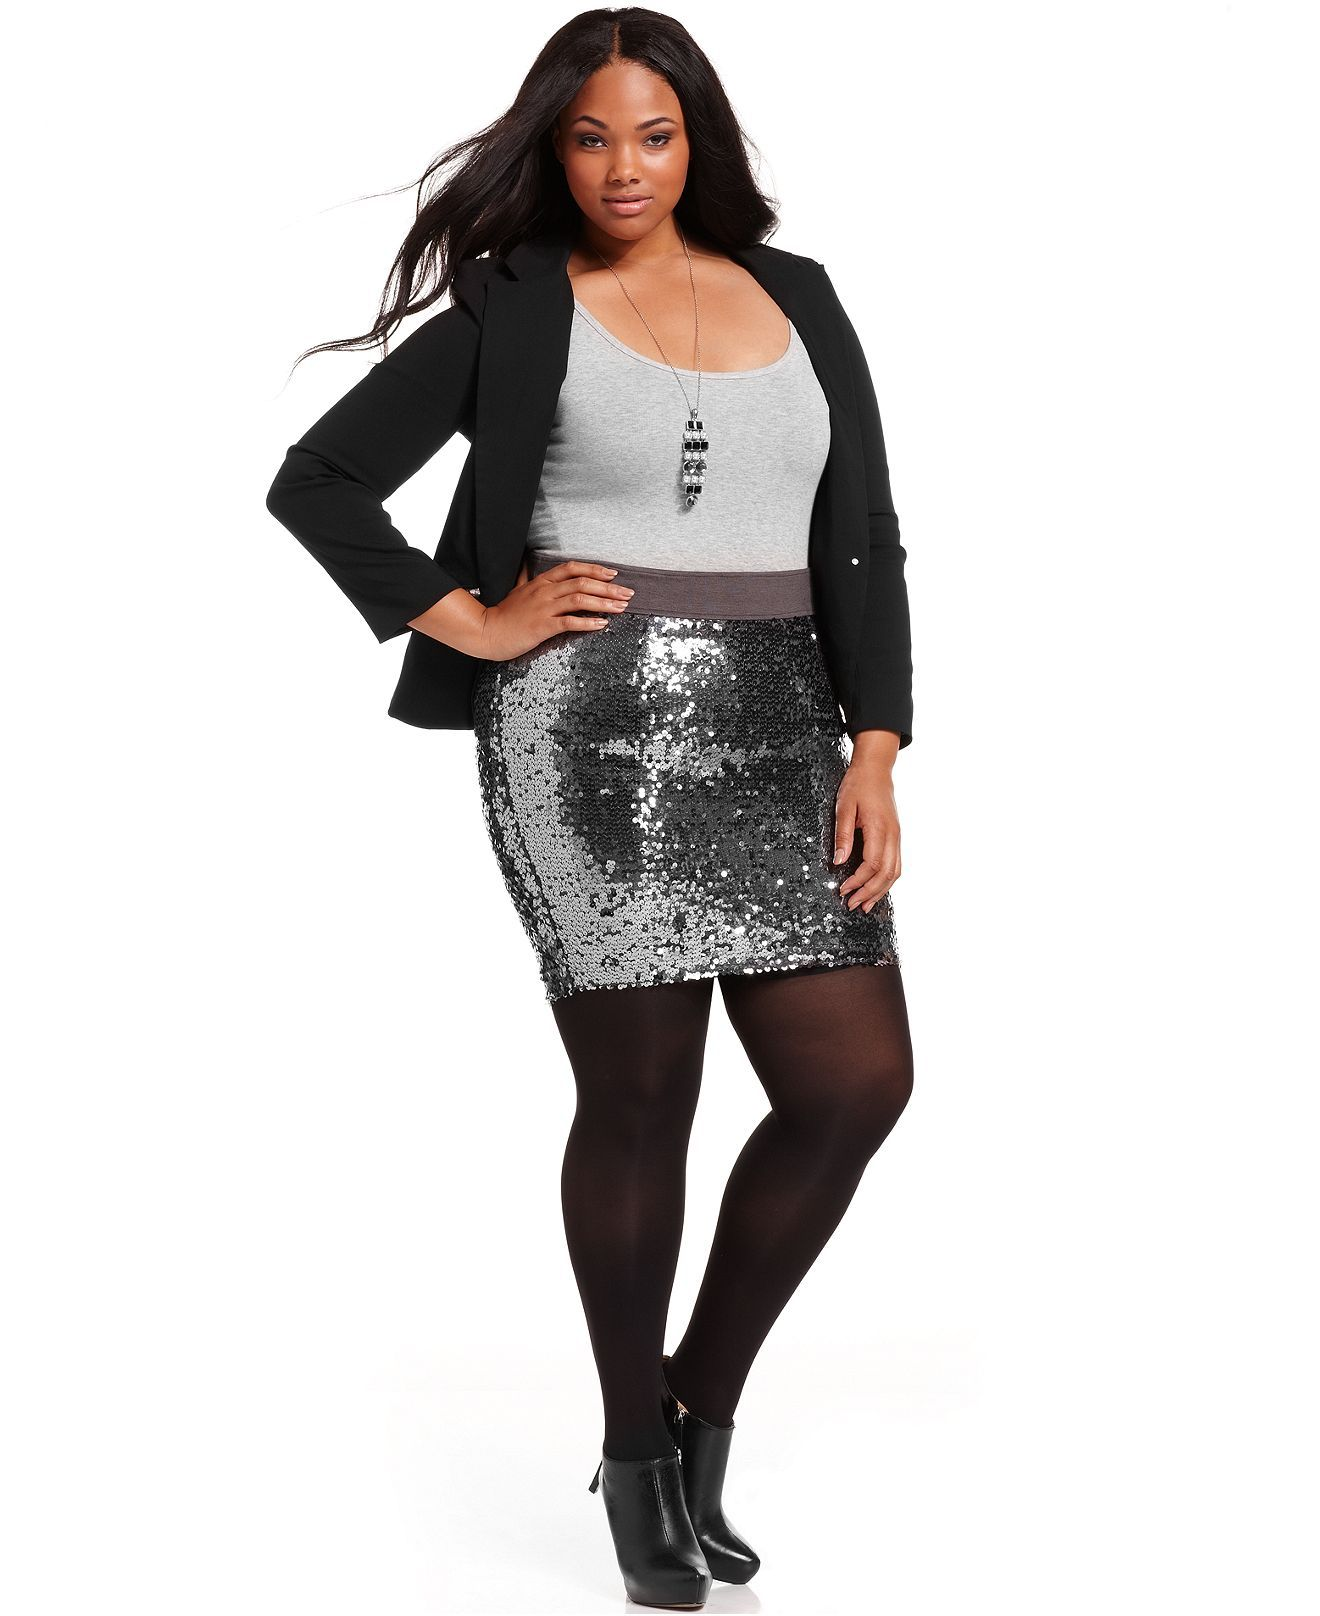 Baby Phat Plus Size Blazer & Sequin Pencil Skirt - Baby Phat ...